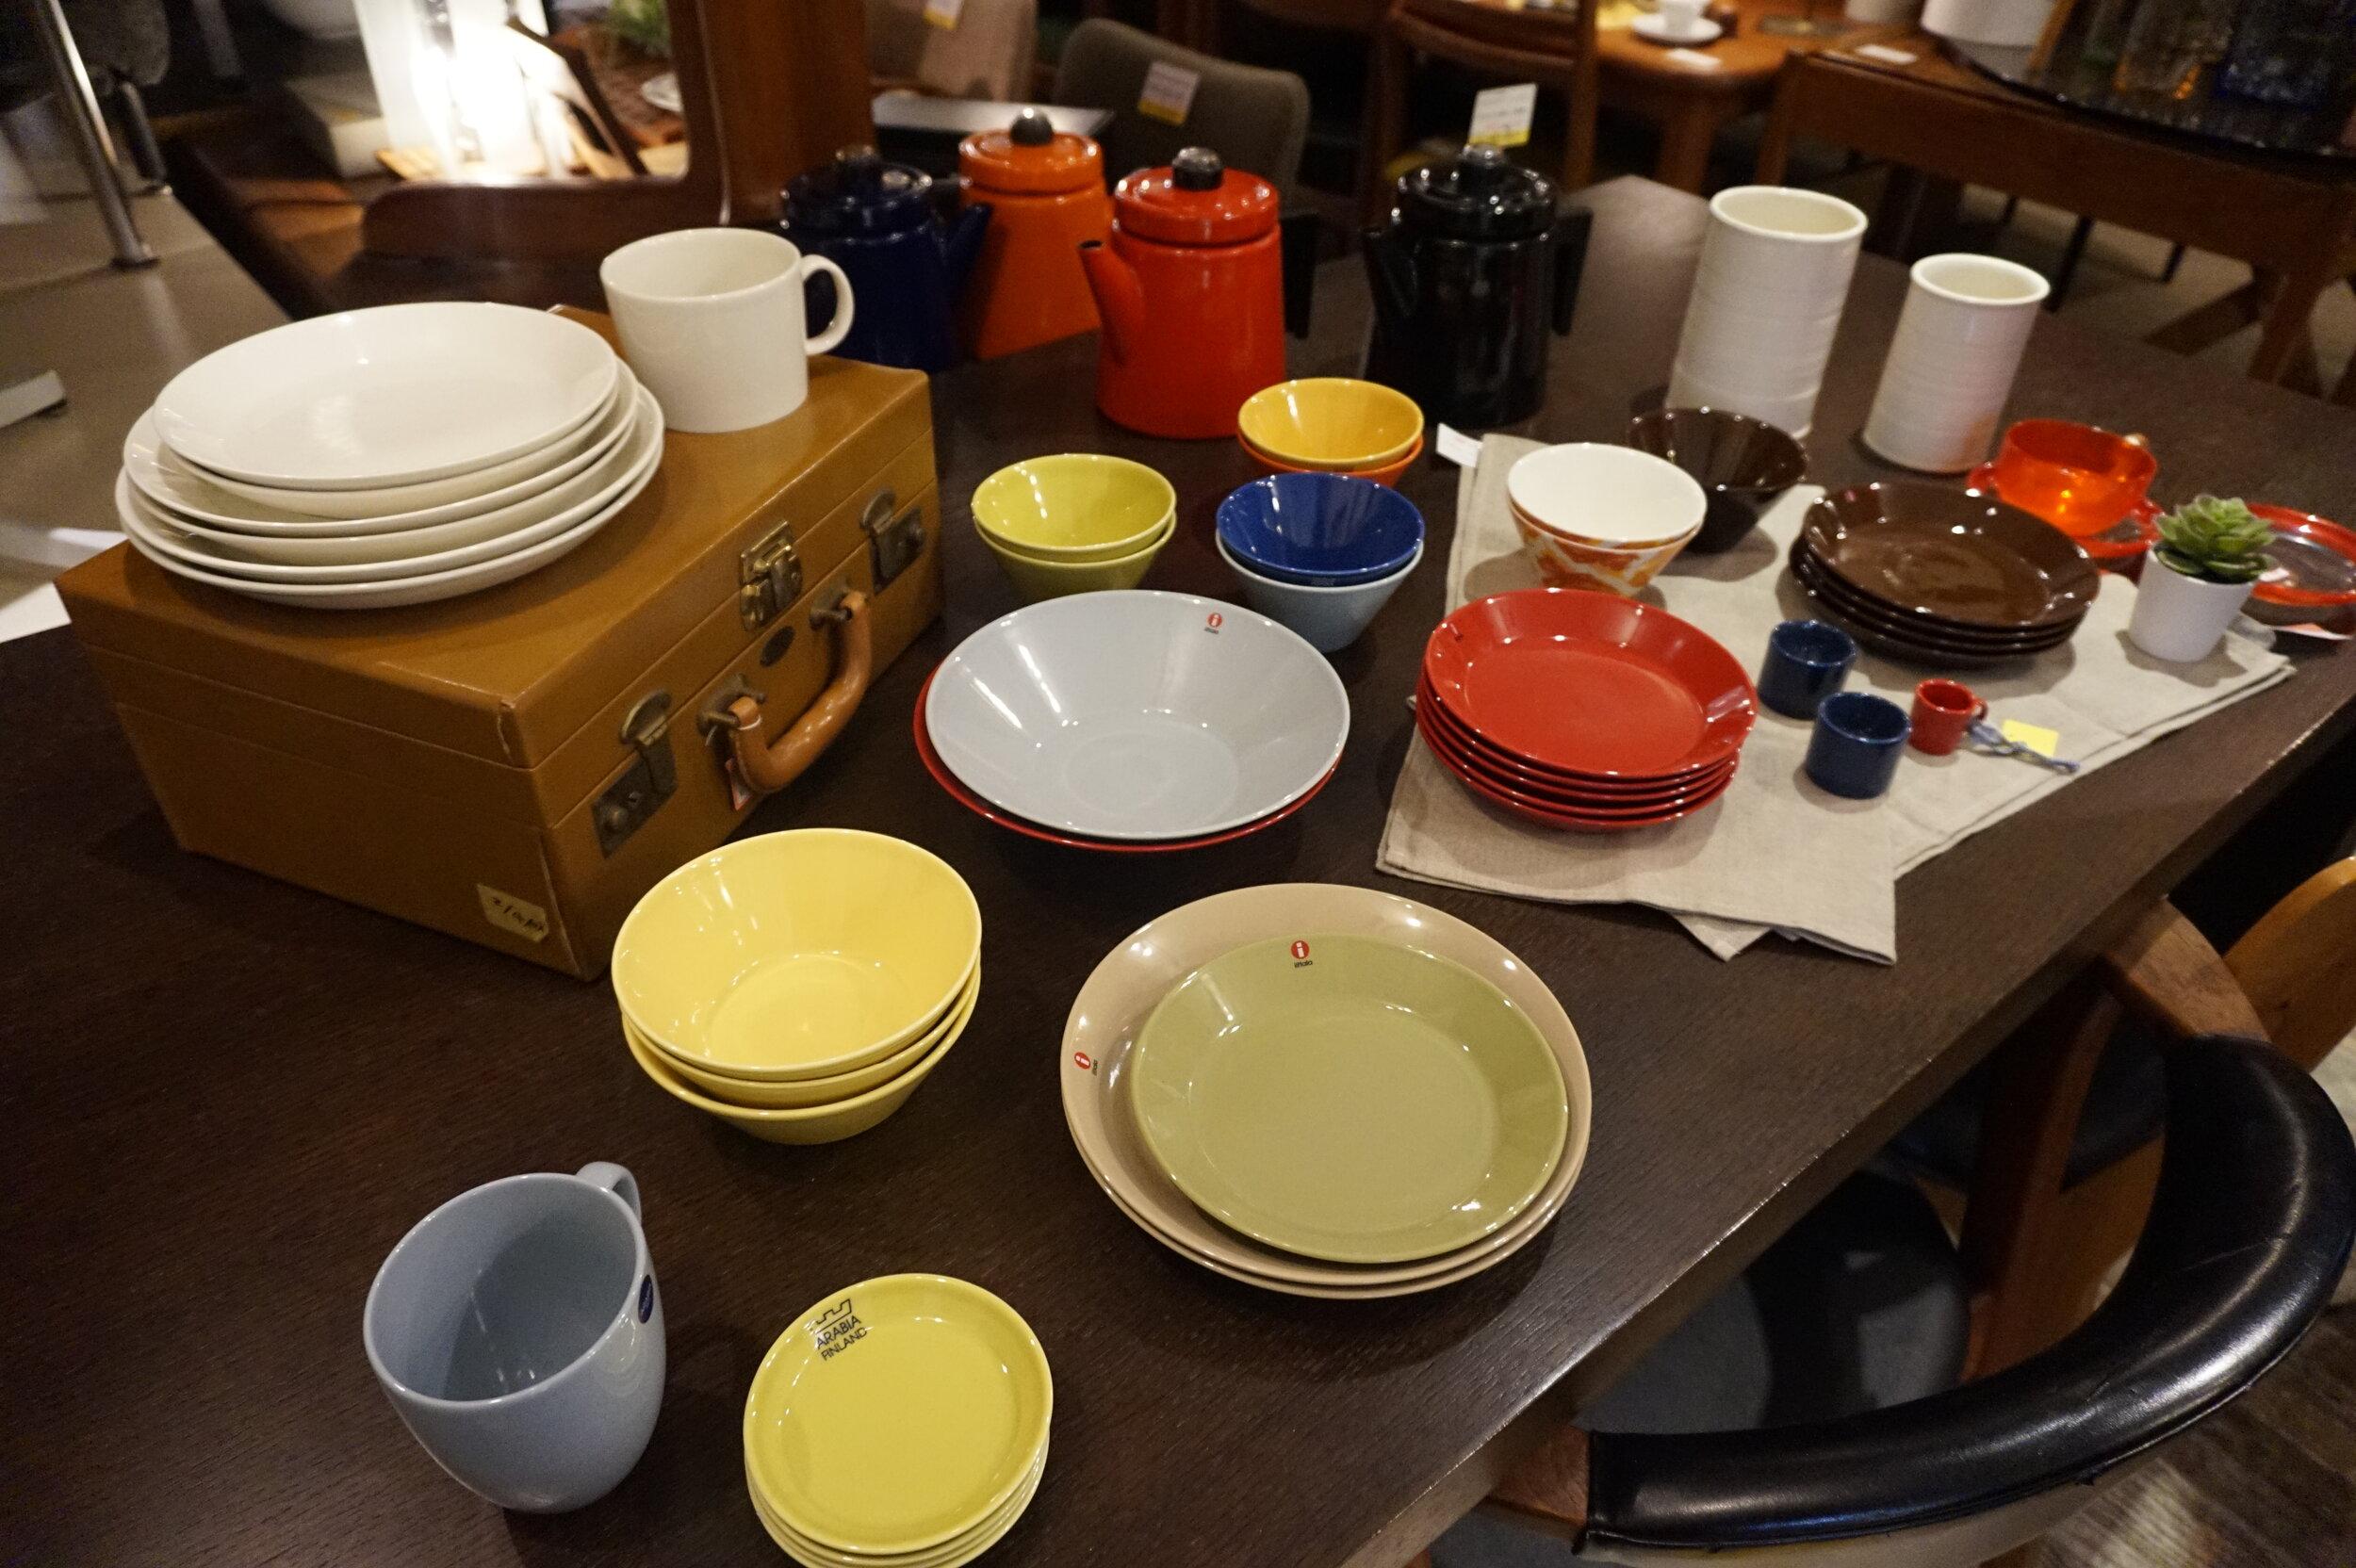 TOKYO RECYCLE imptionの店内にはおしゃれな家具やインテリア雑貨が所狭しと並んでいる